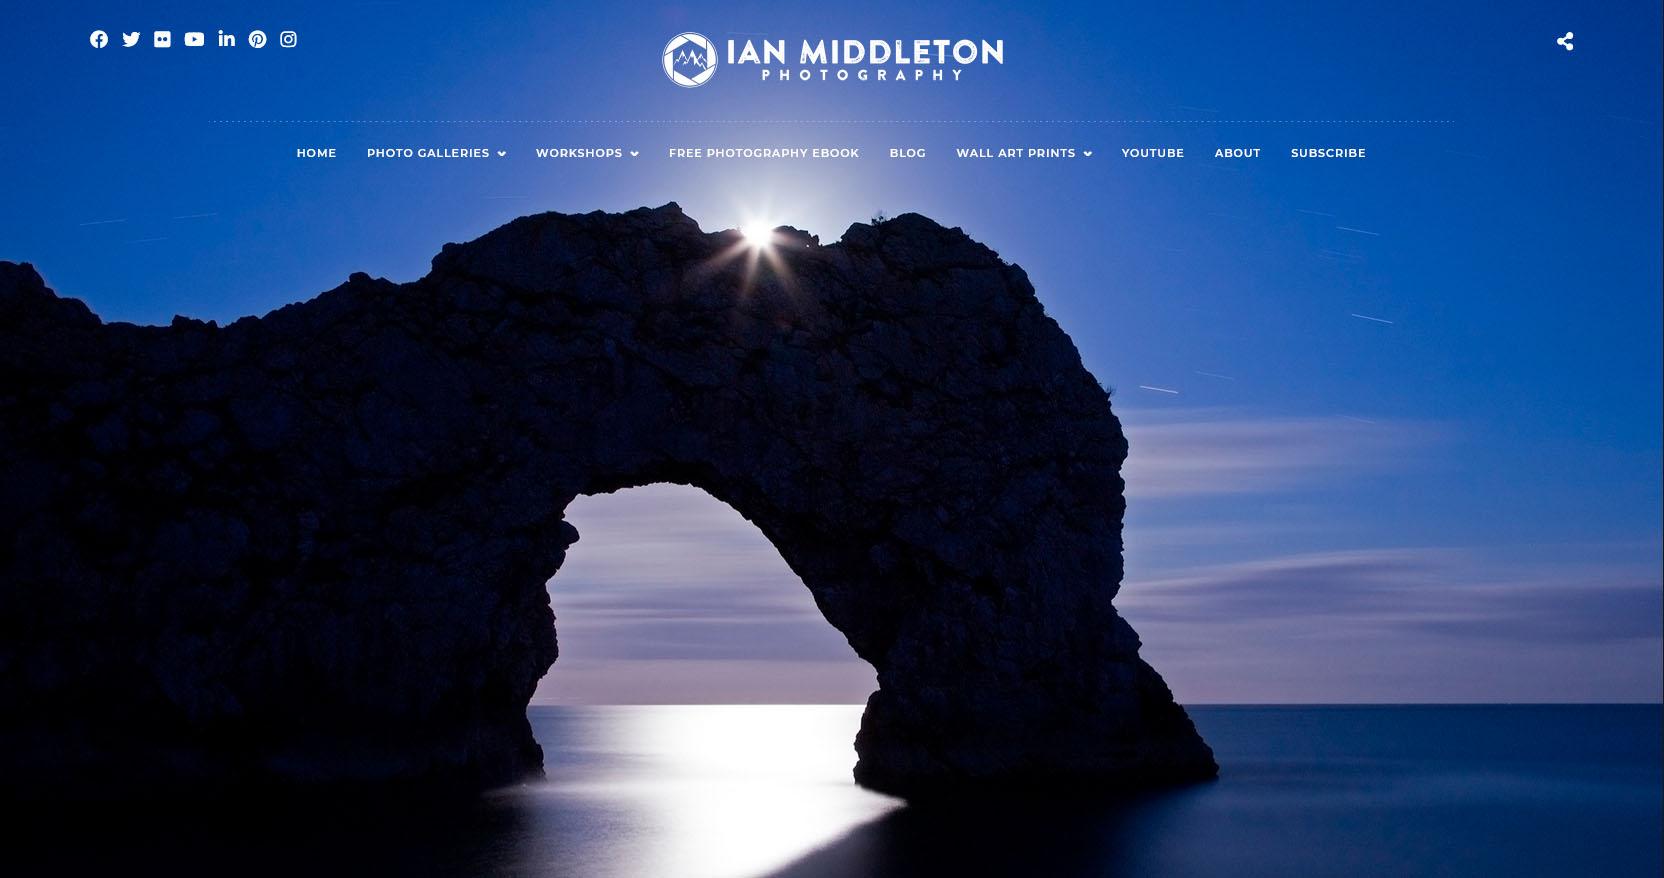 Ian Middleton Photography website